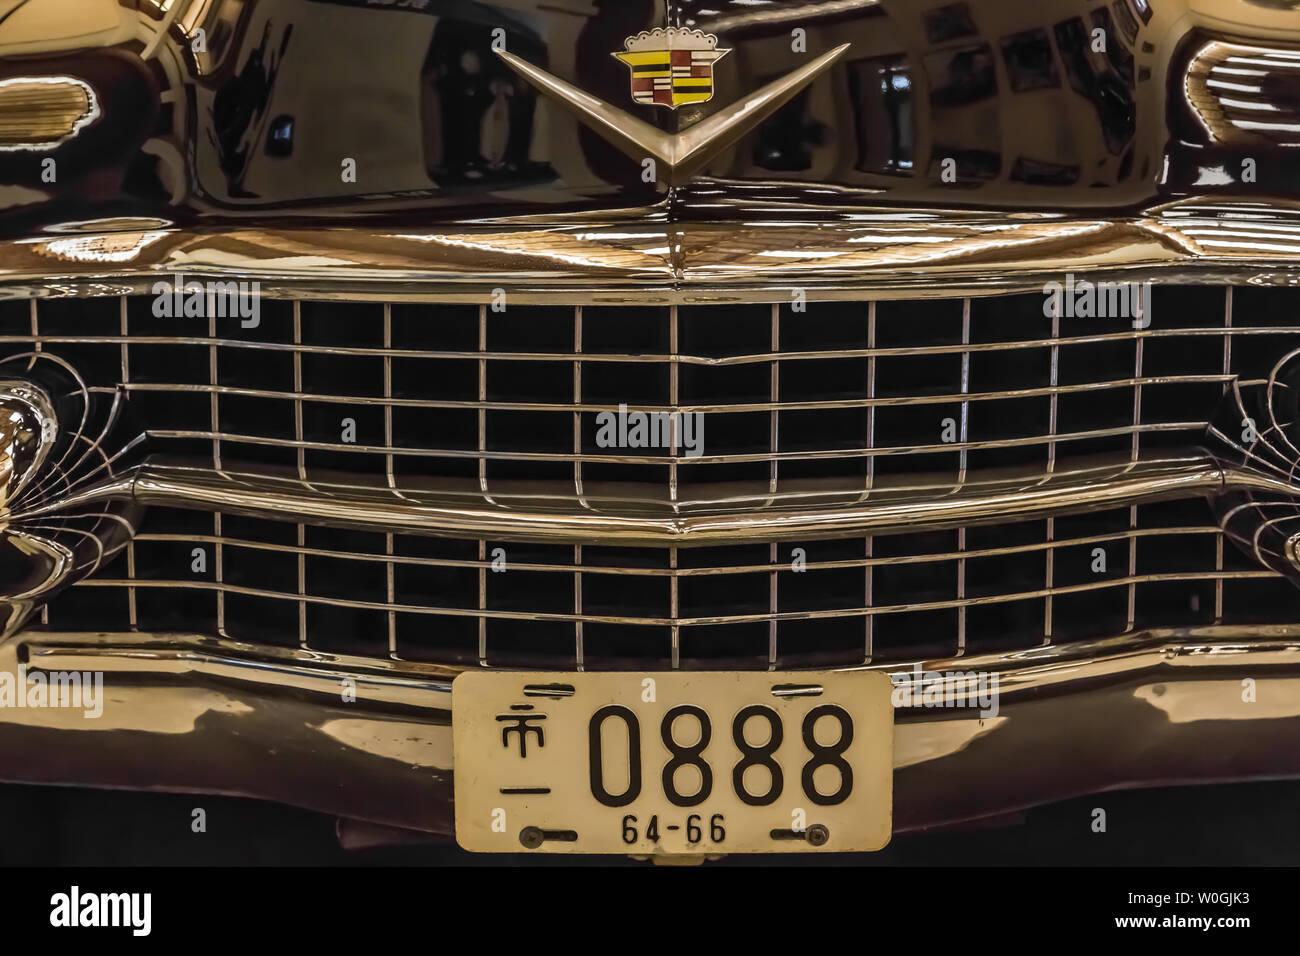 Taiwan,Taipei-05 SEP 2017: Chiang Kai shek car display in memorial hall - Stock Image